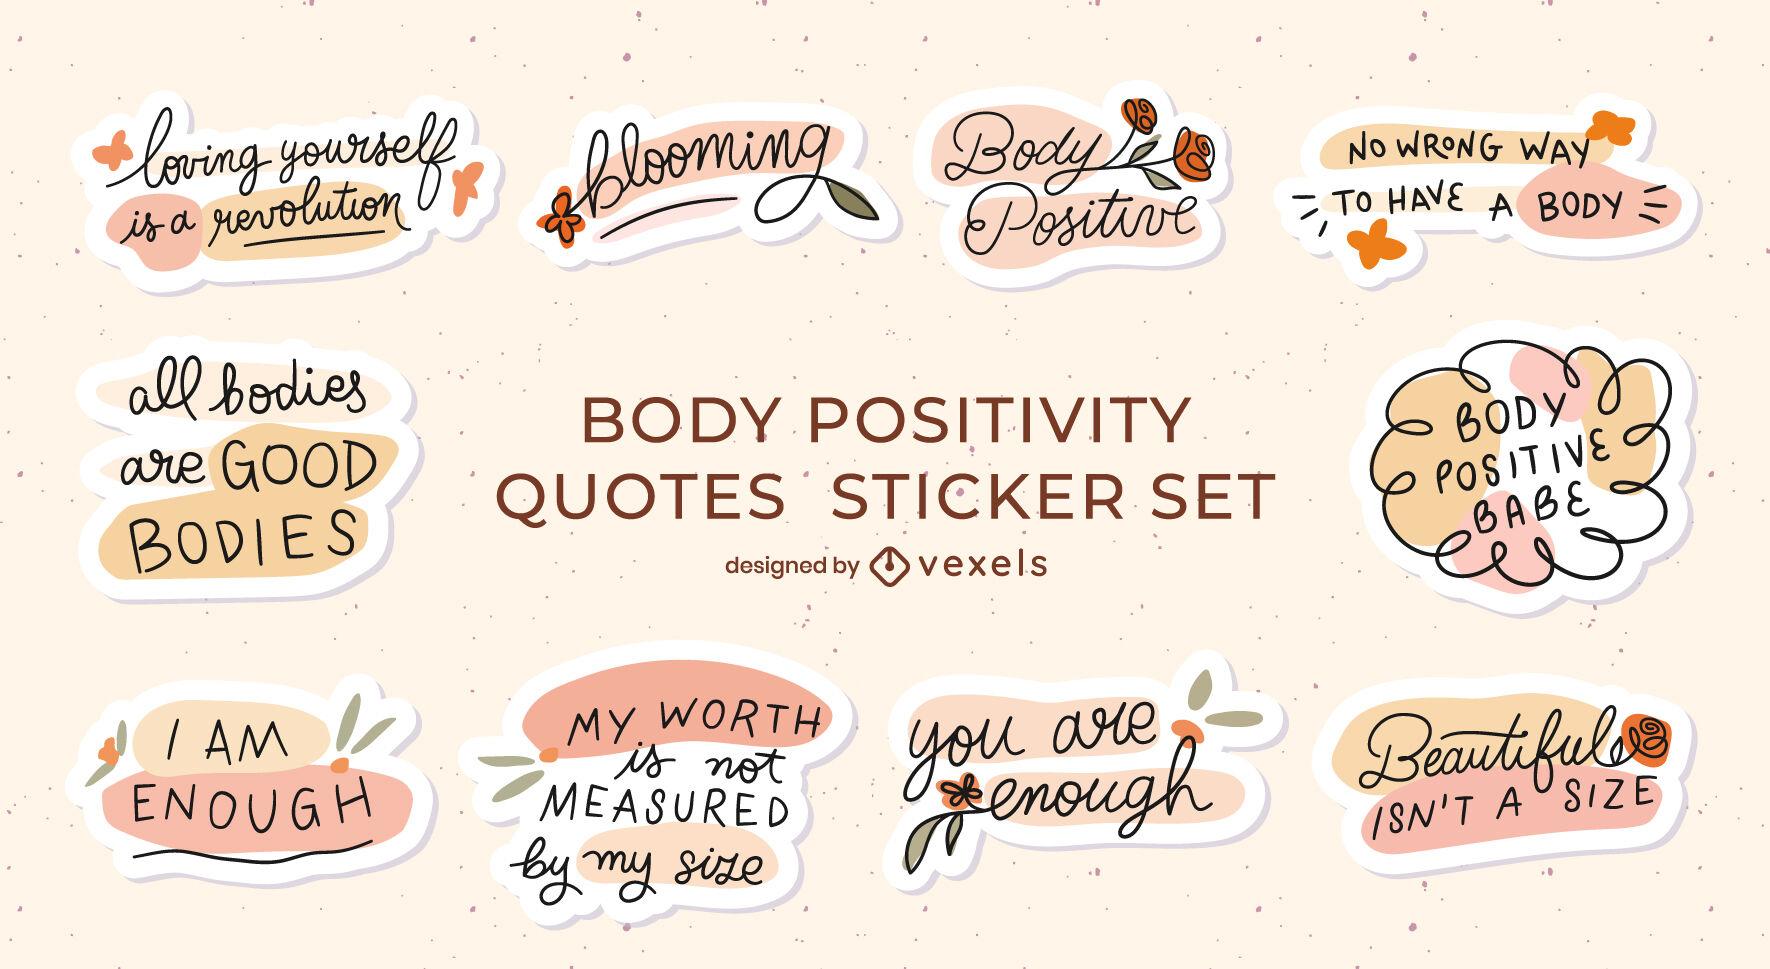 Body positivity movement messages badge set